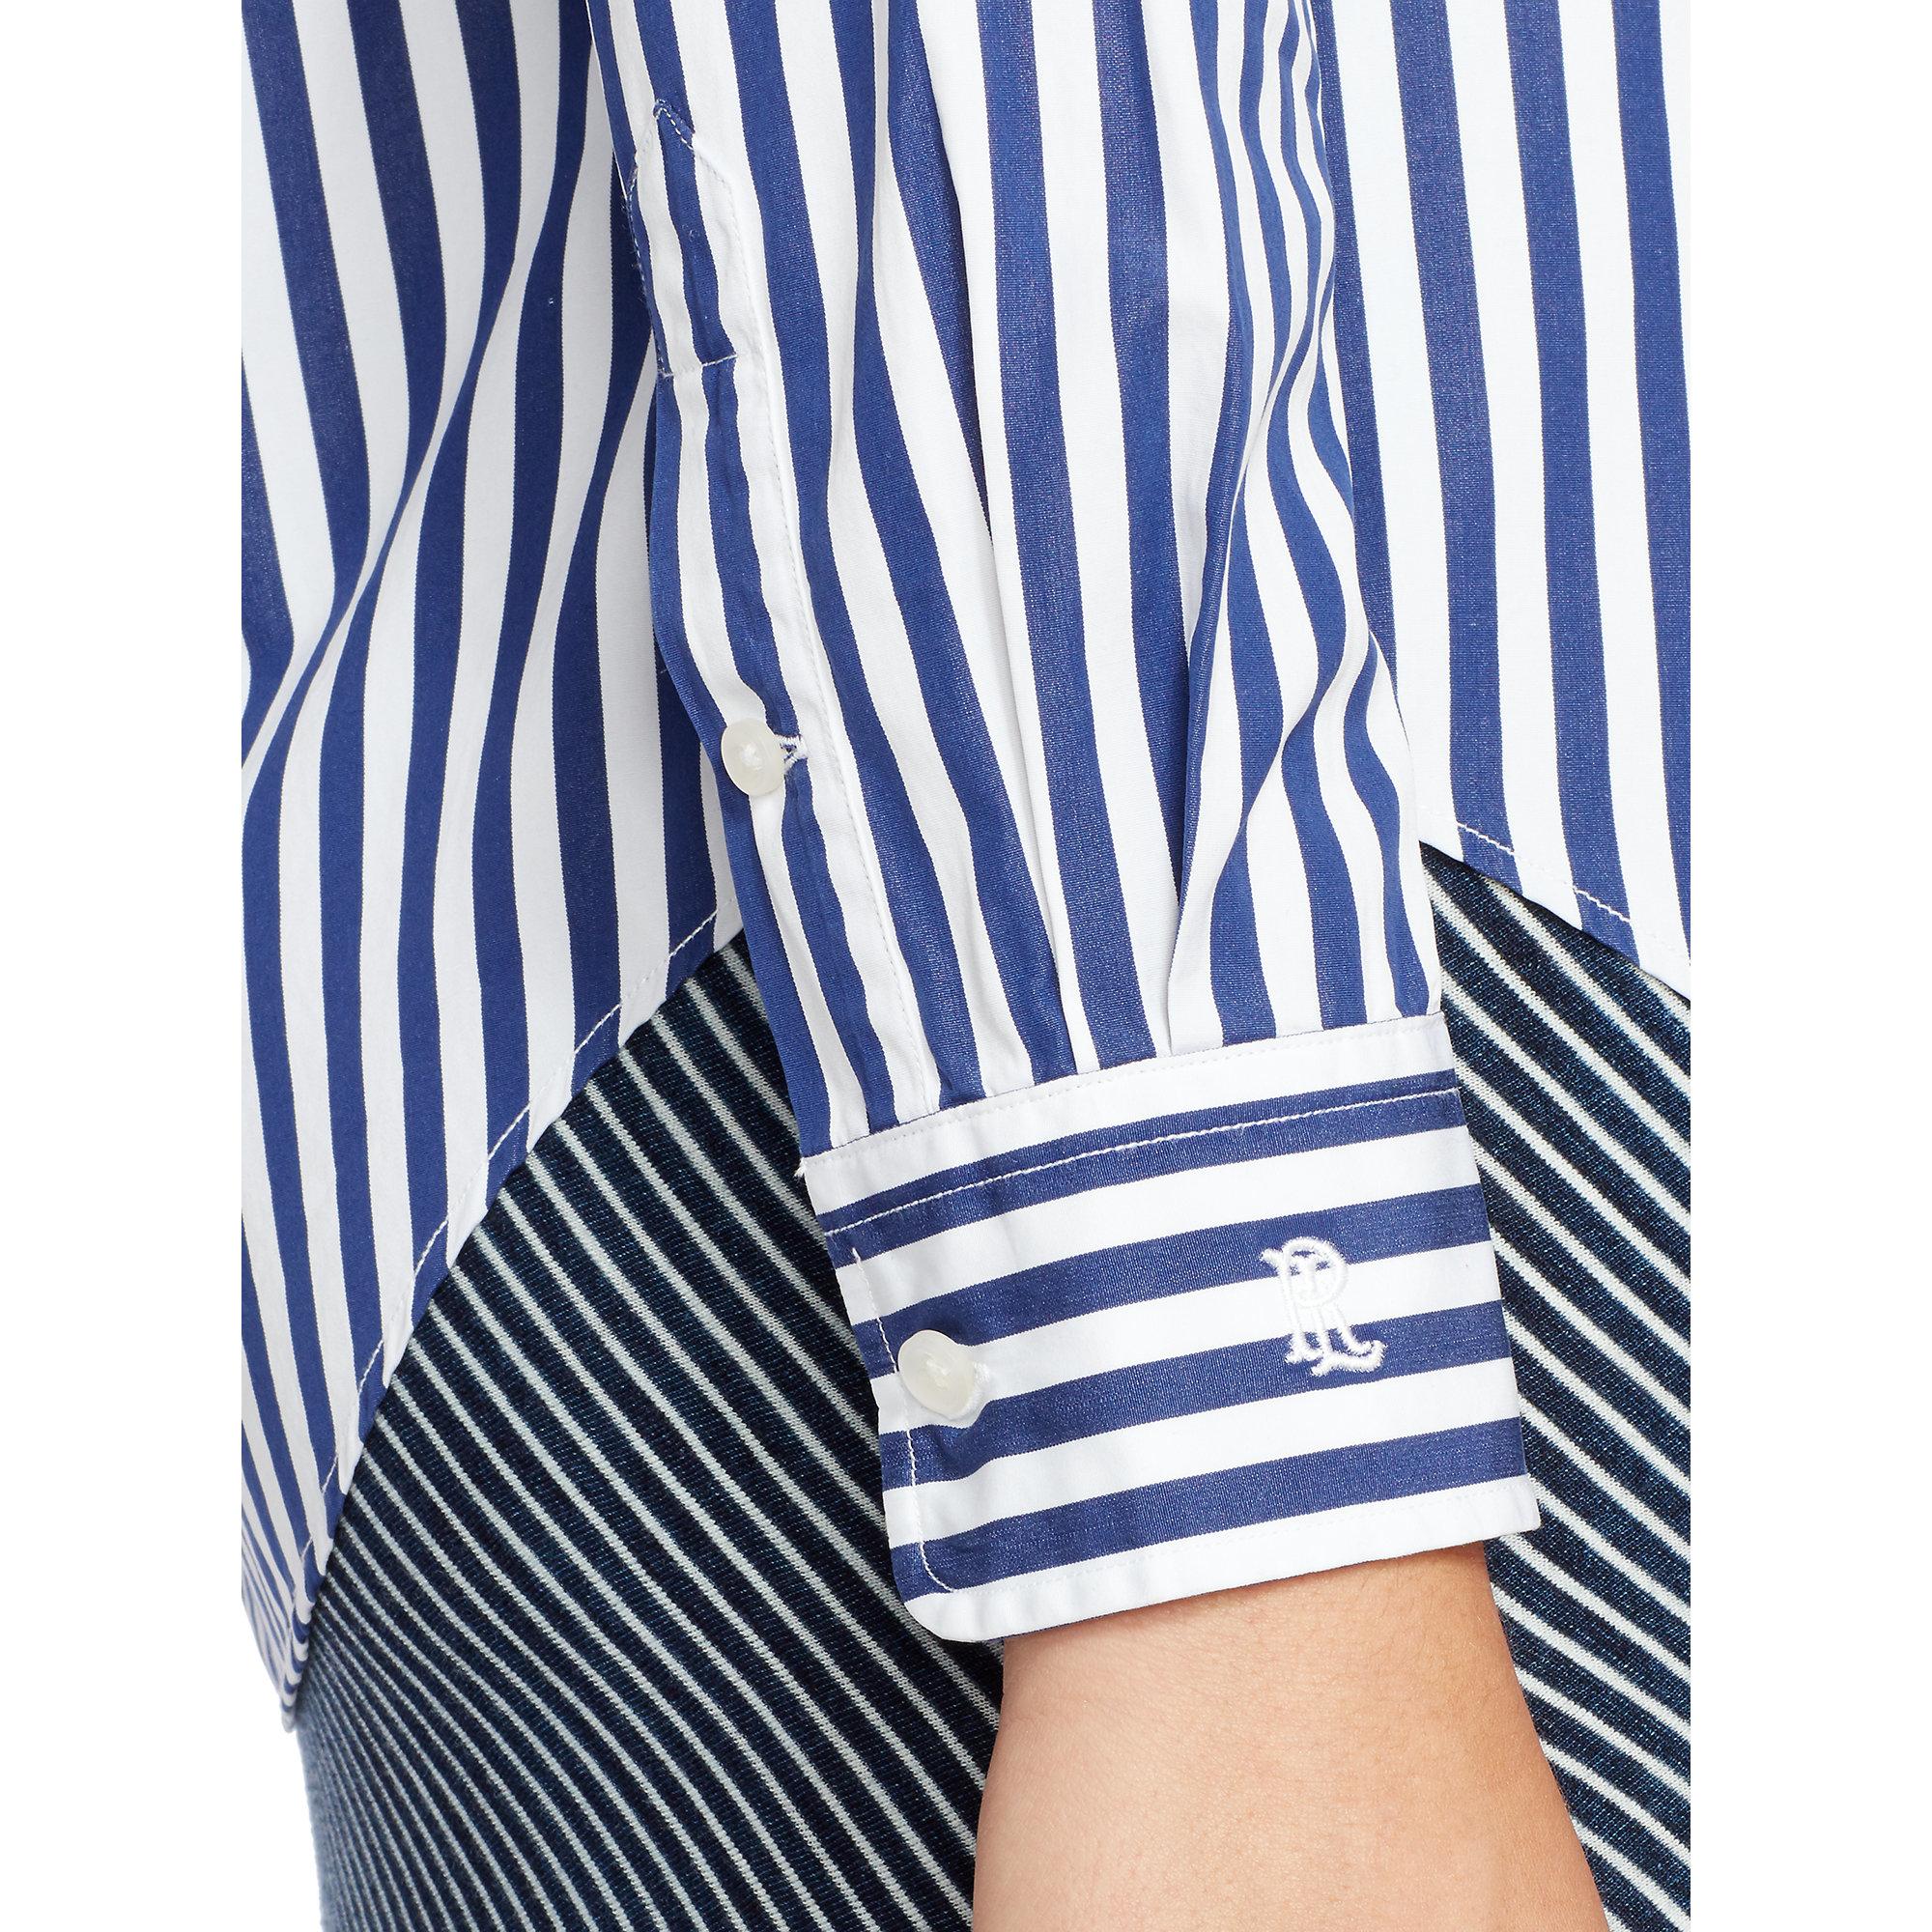 93dea957 Polo Ralph Lauren Bengal-striped Cotton Shirt in Blue - Lyst